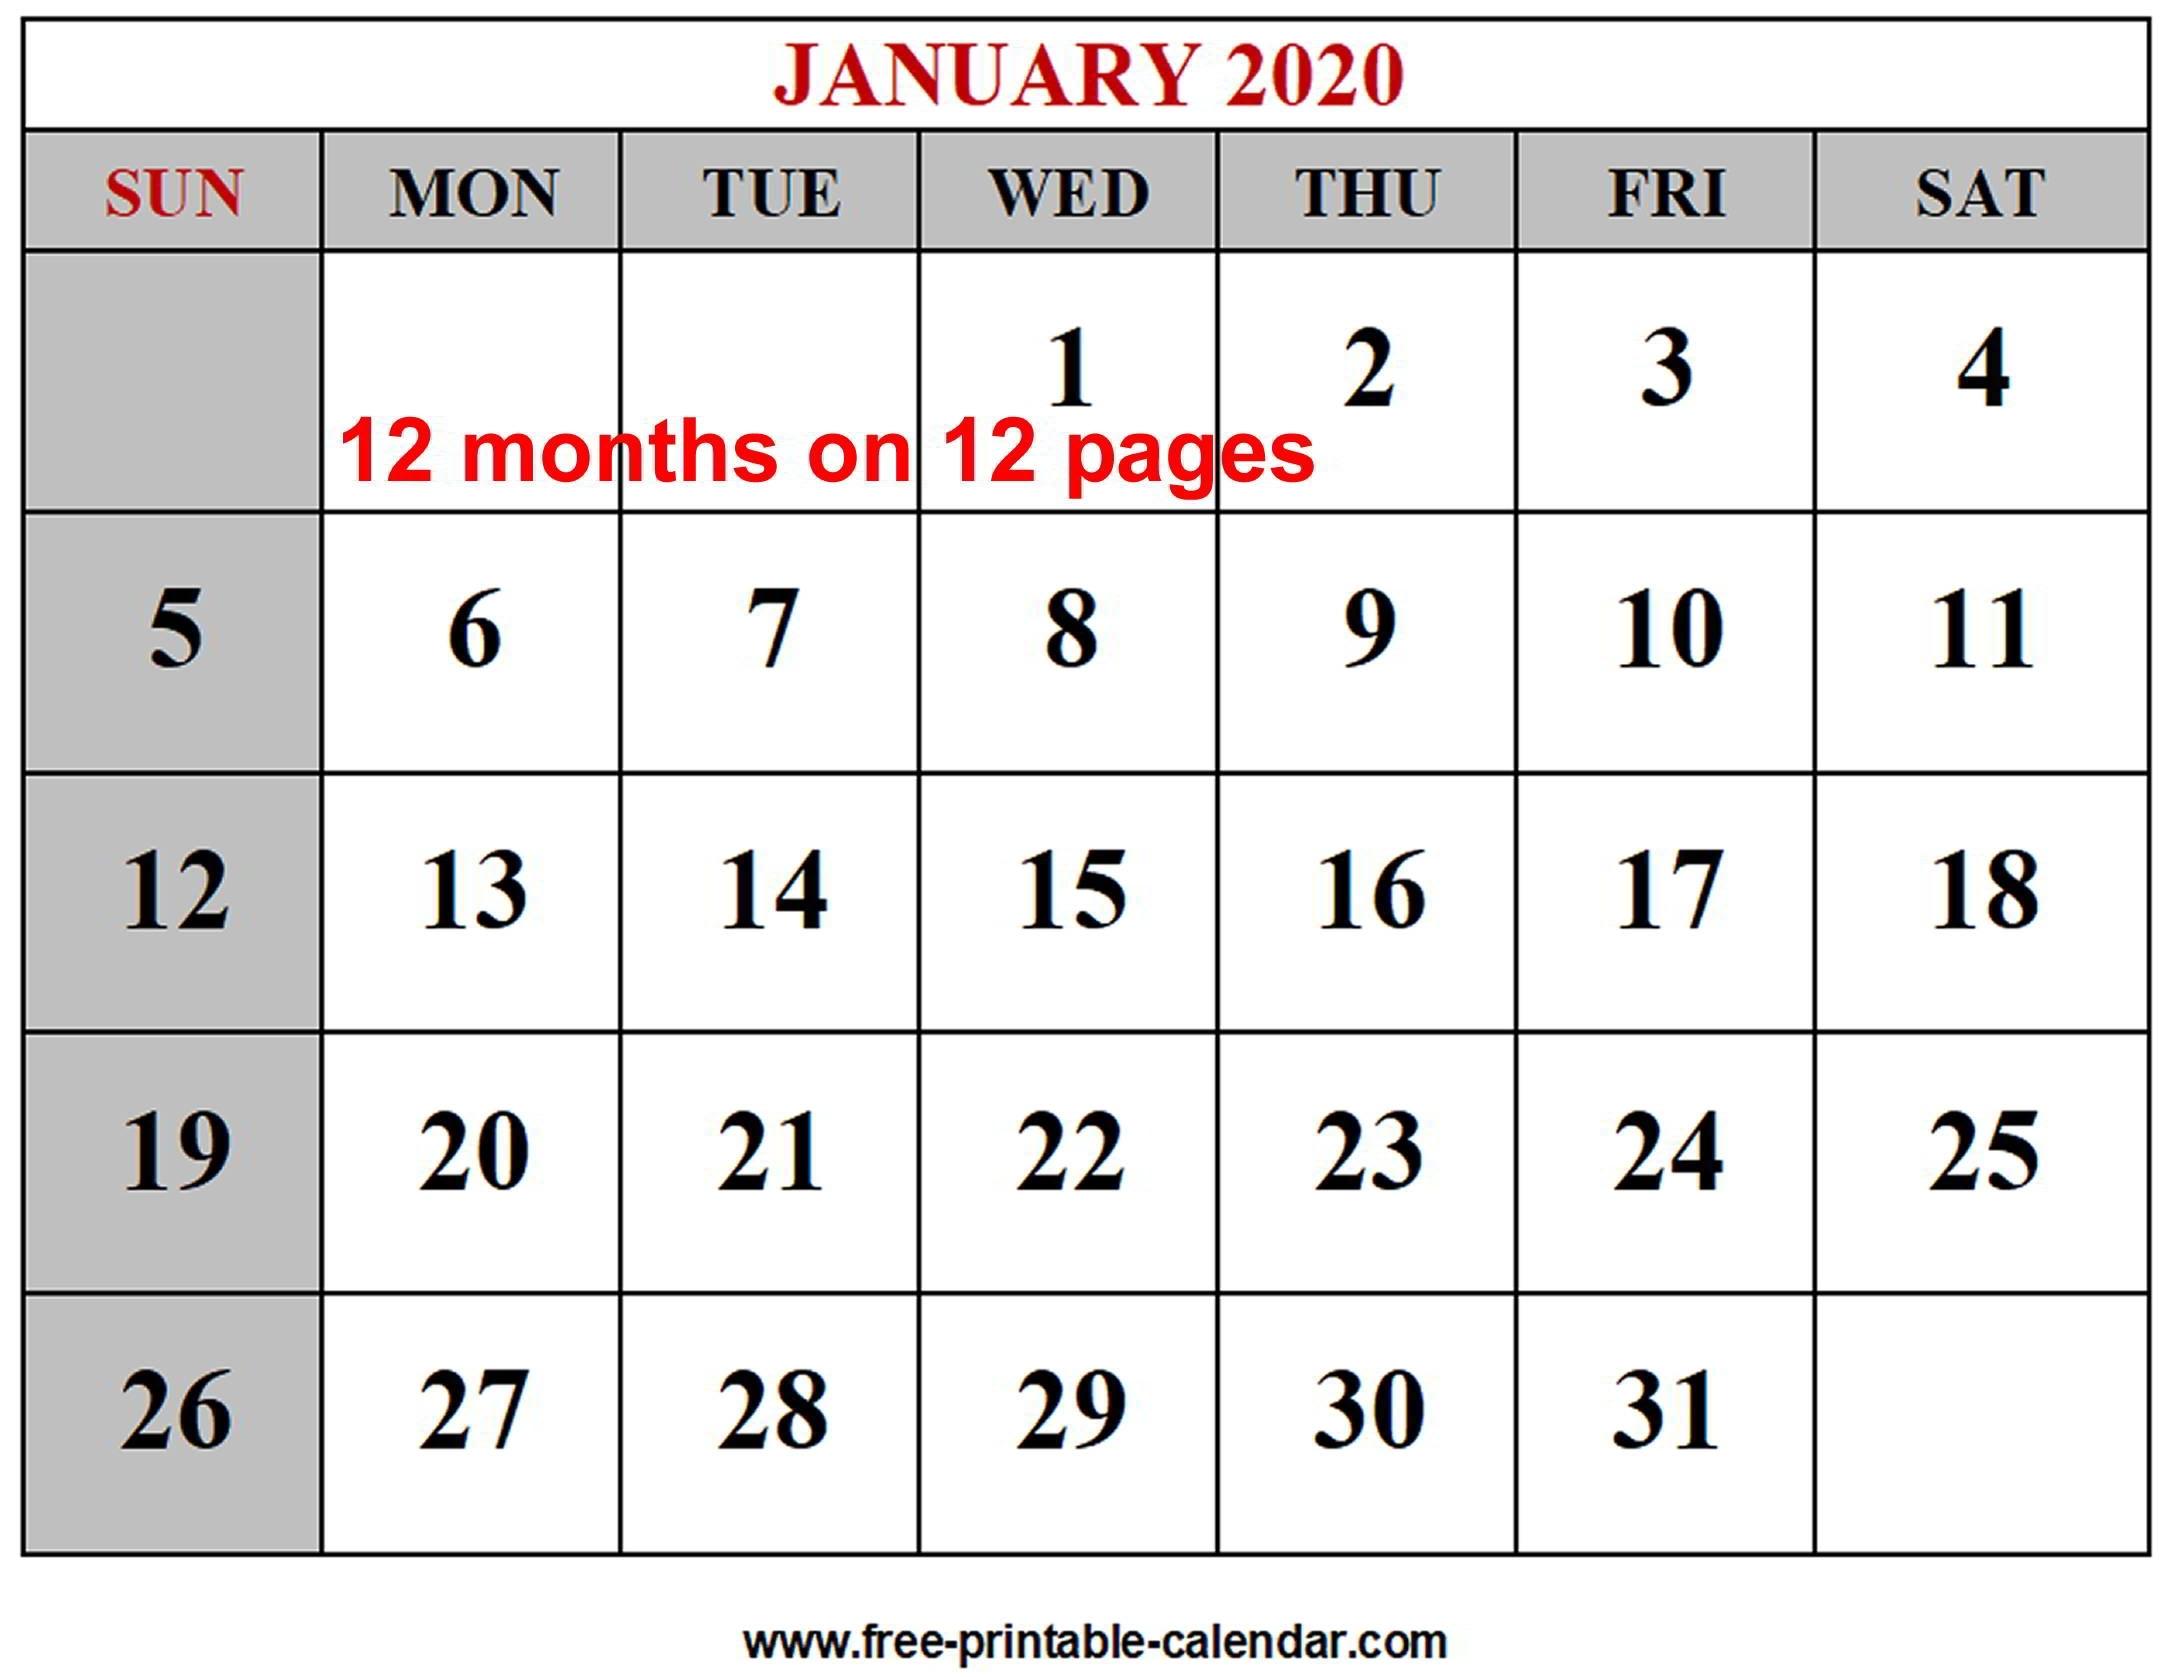 Year 2020 Calendar Templates - Free-Printable-Calendar within Printable Monthly Calendar 2020 Free